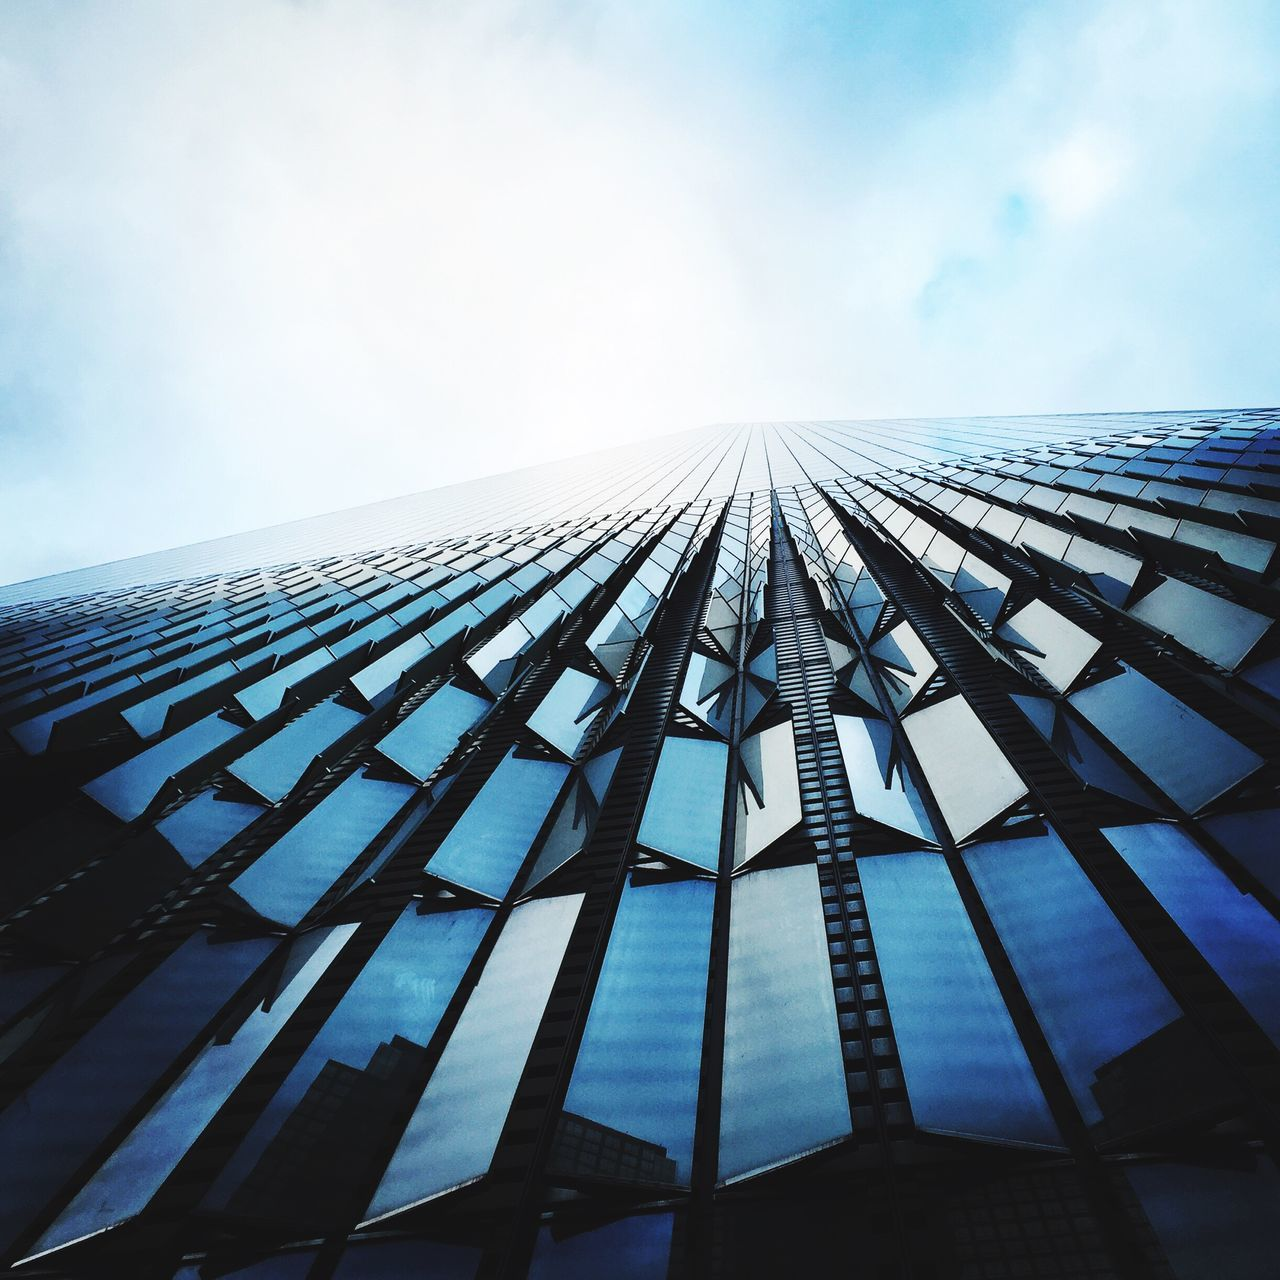 Pivotal Ideas BCG New York NYC New York City Newyork Architecture Modern WorldTradeCenter Oneworldtradecenter